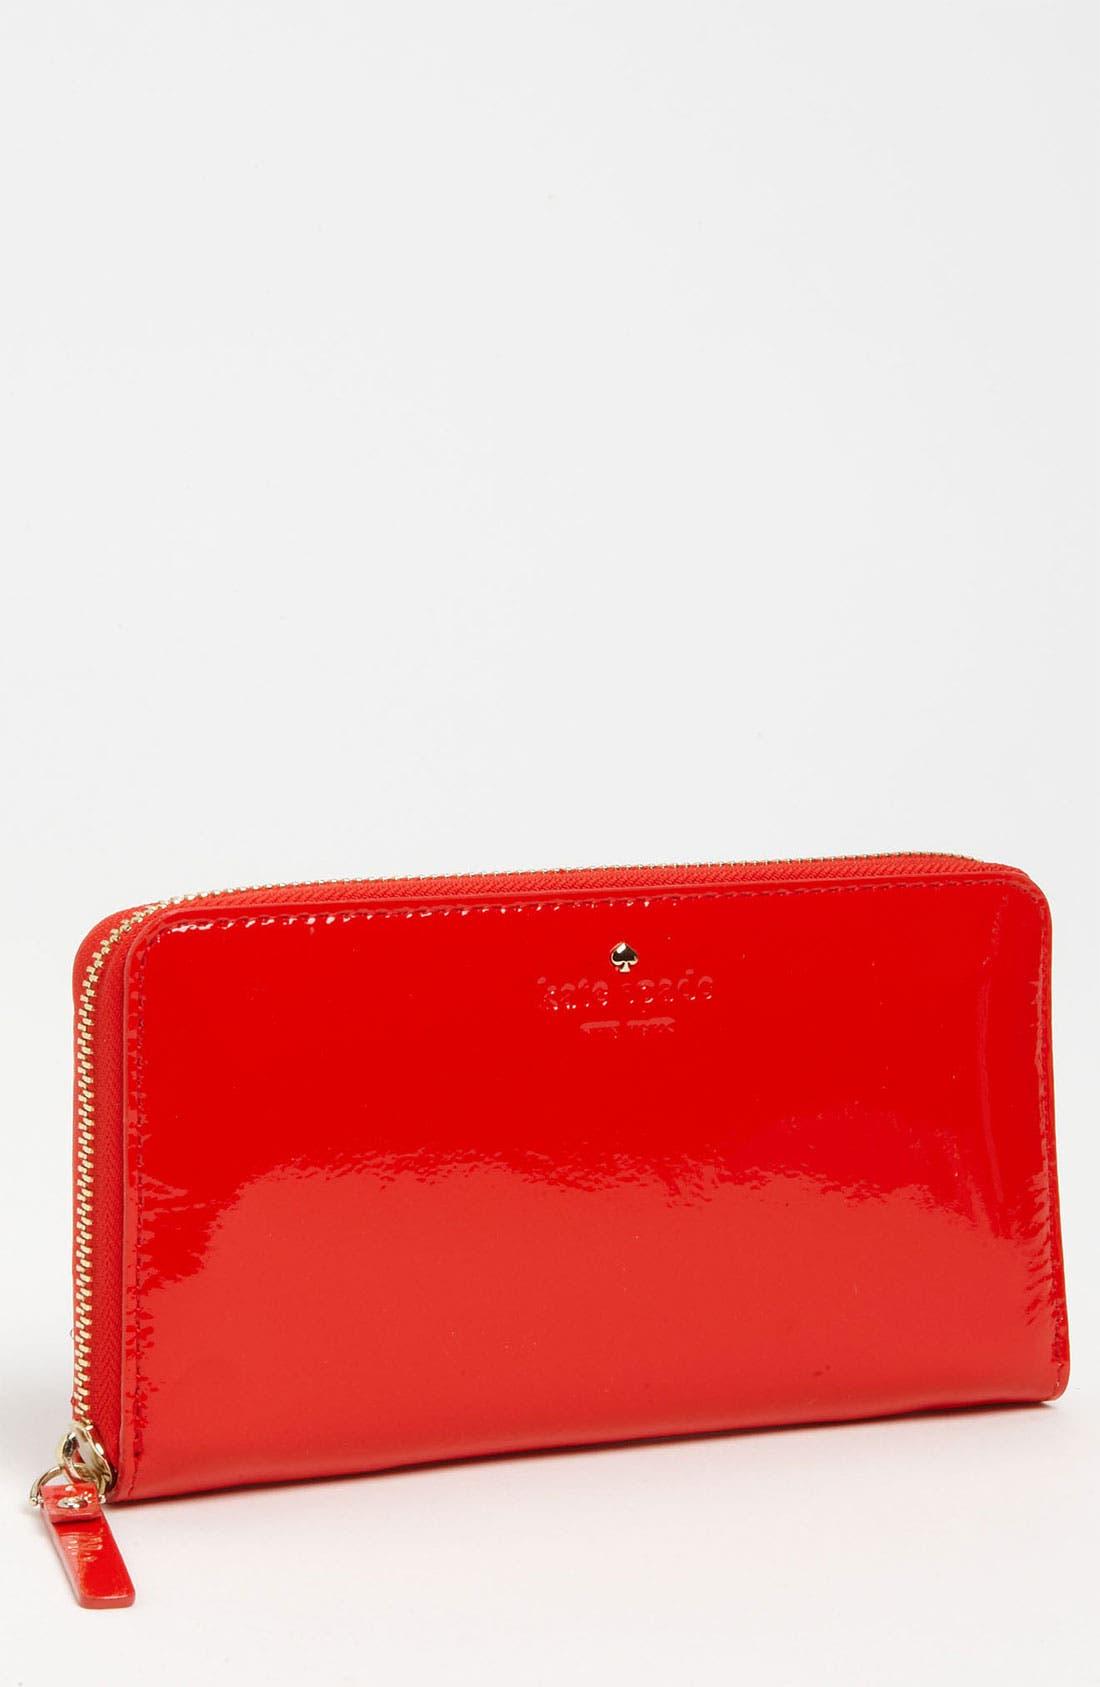 Main Image - kate spade new york 'harrison street - lacey' wallet